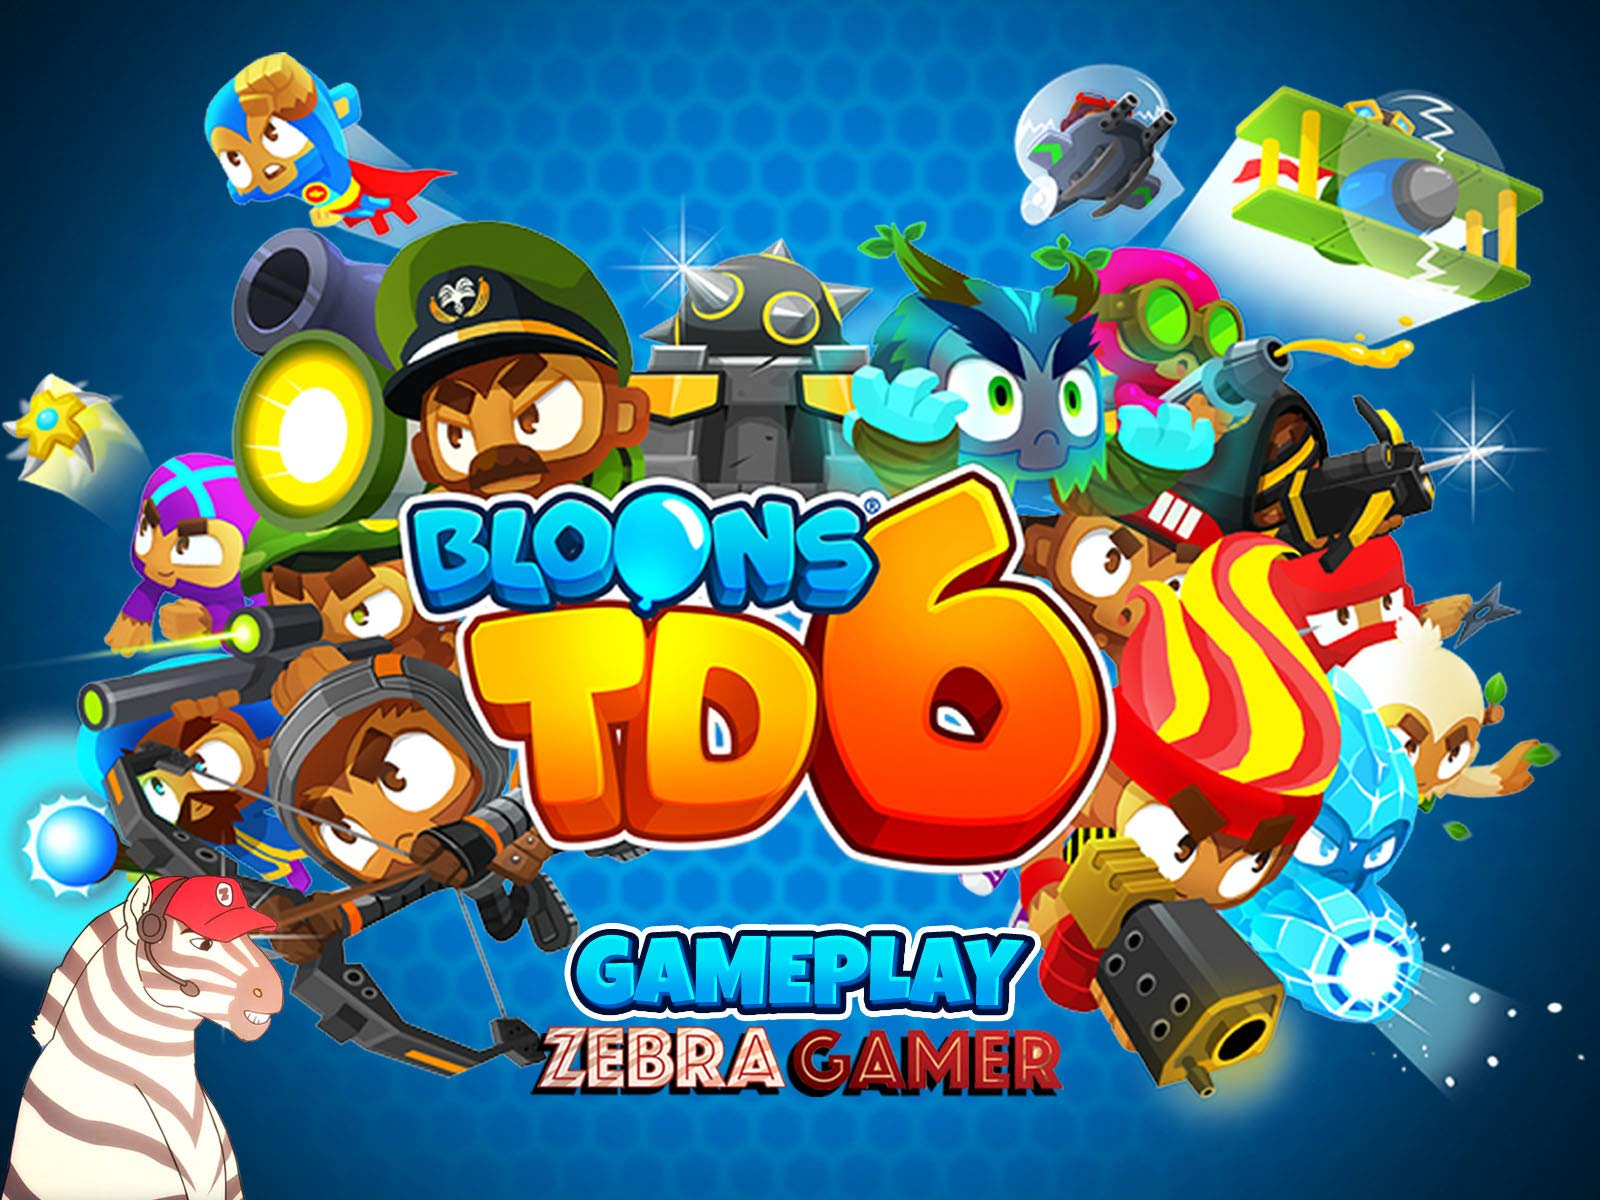 Clip: Bloons TD 6 Gameplay - Zebra Gamer - Season 1